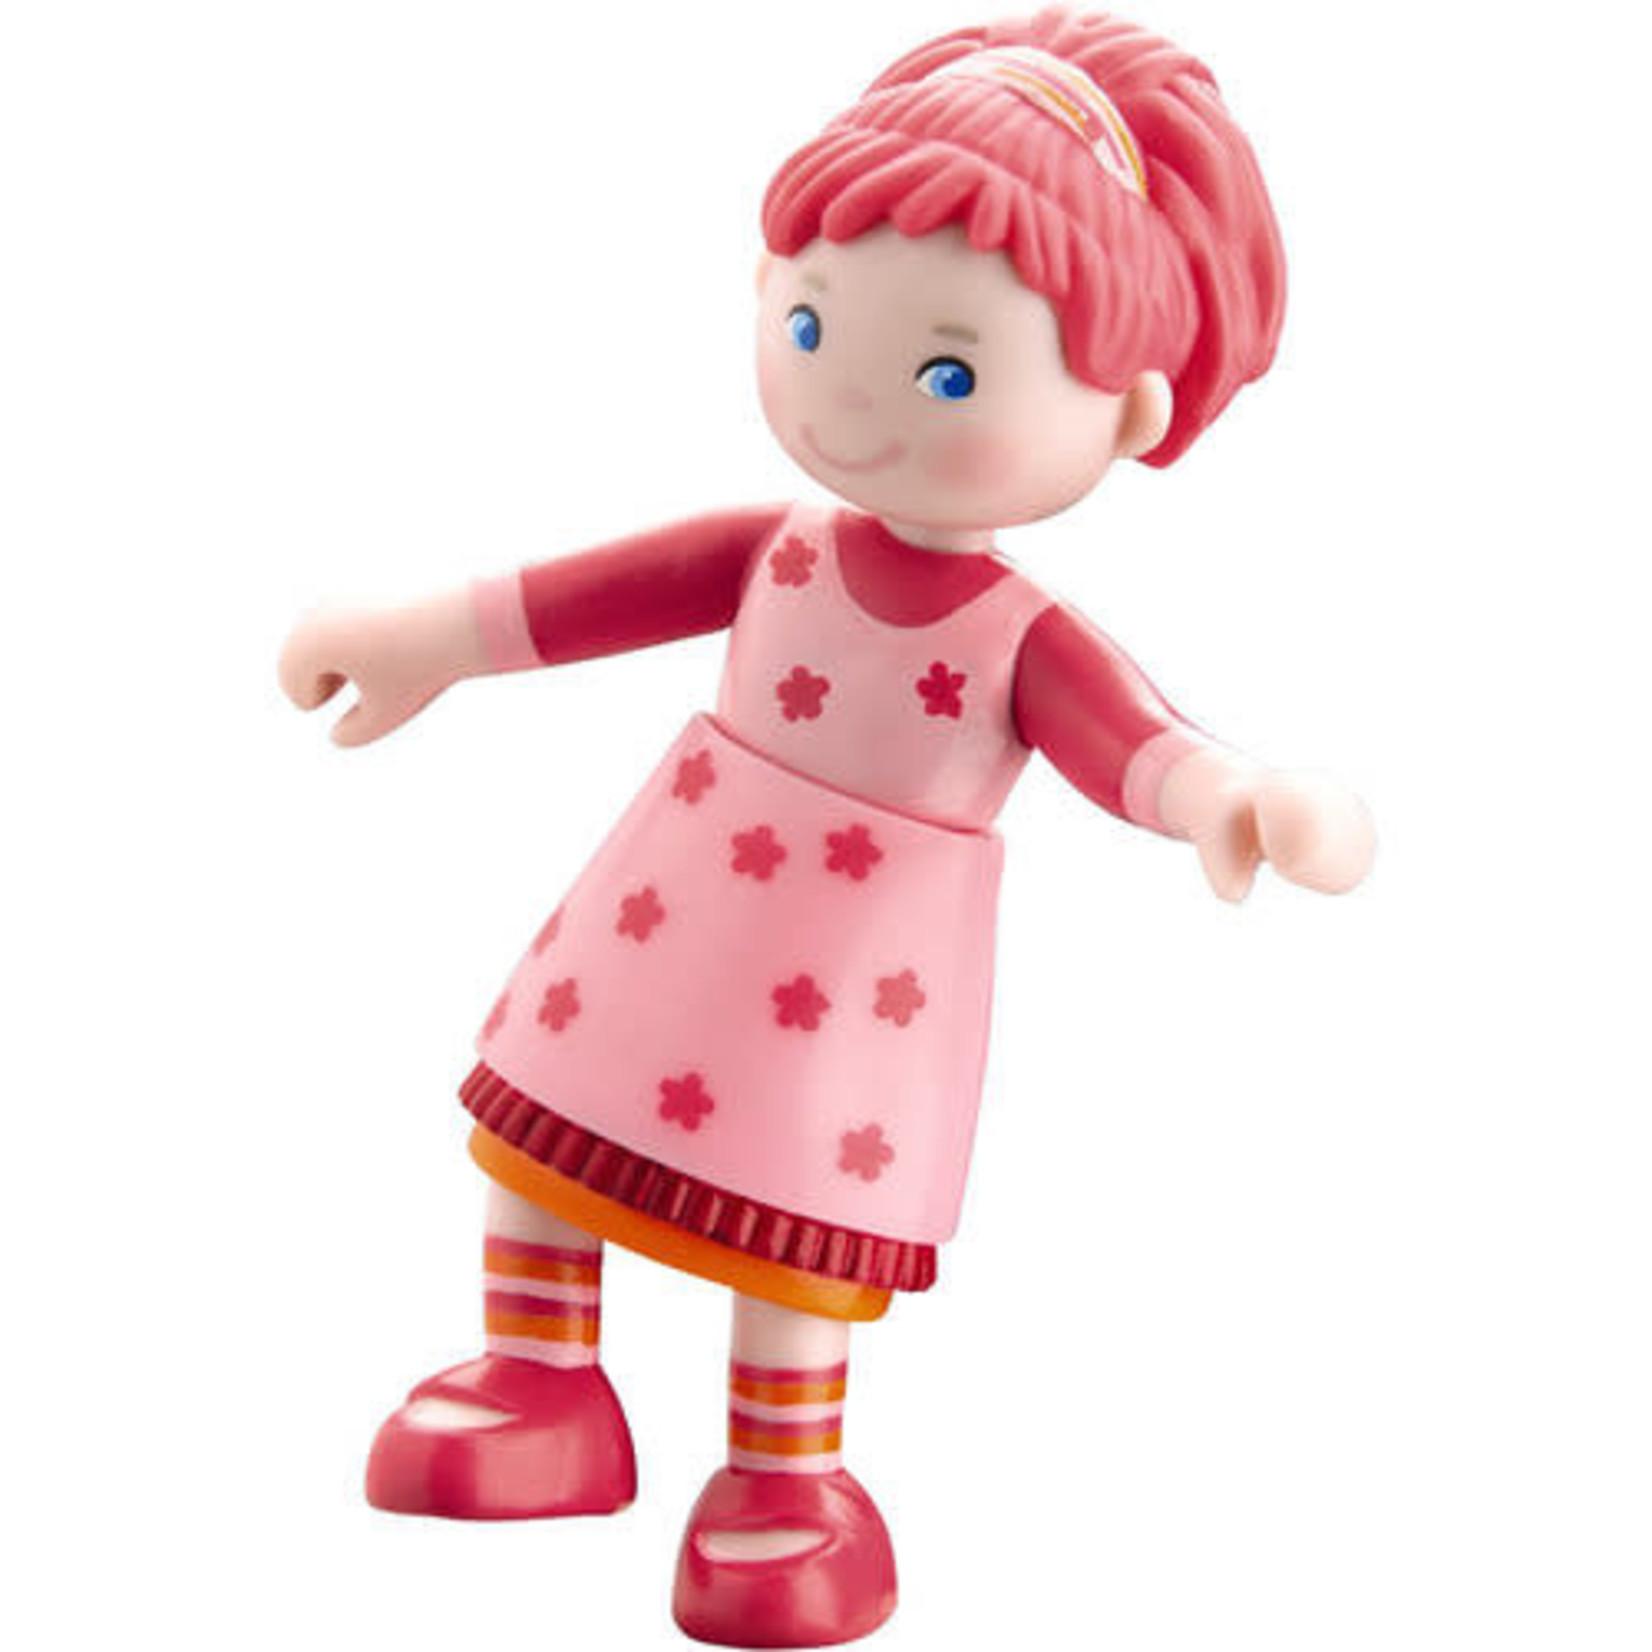 Haba Little Friends - Lilli